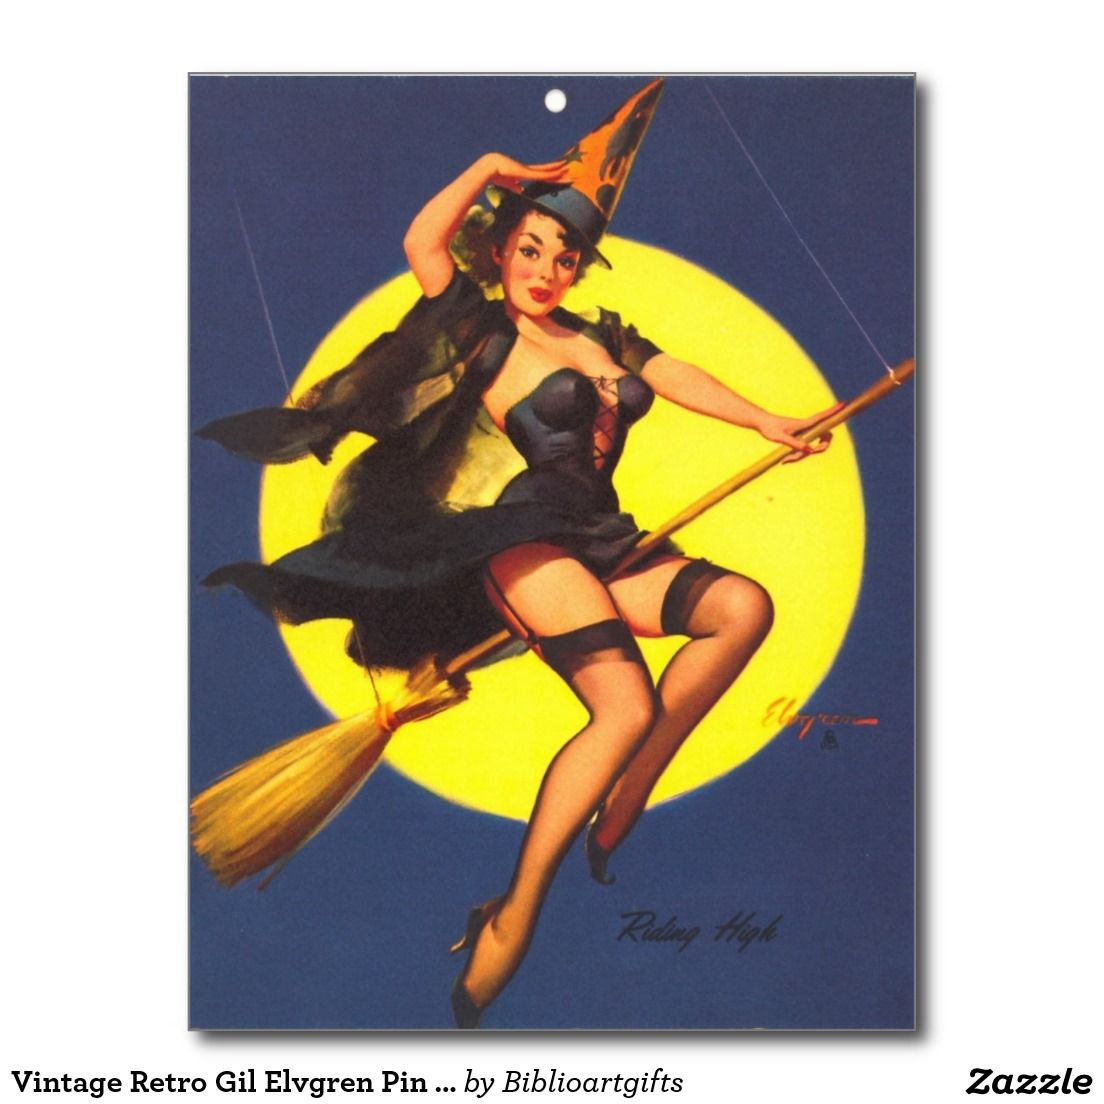 vintage retro pin up girl postcard | pin_up girls cards | pinterest